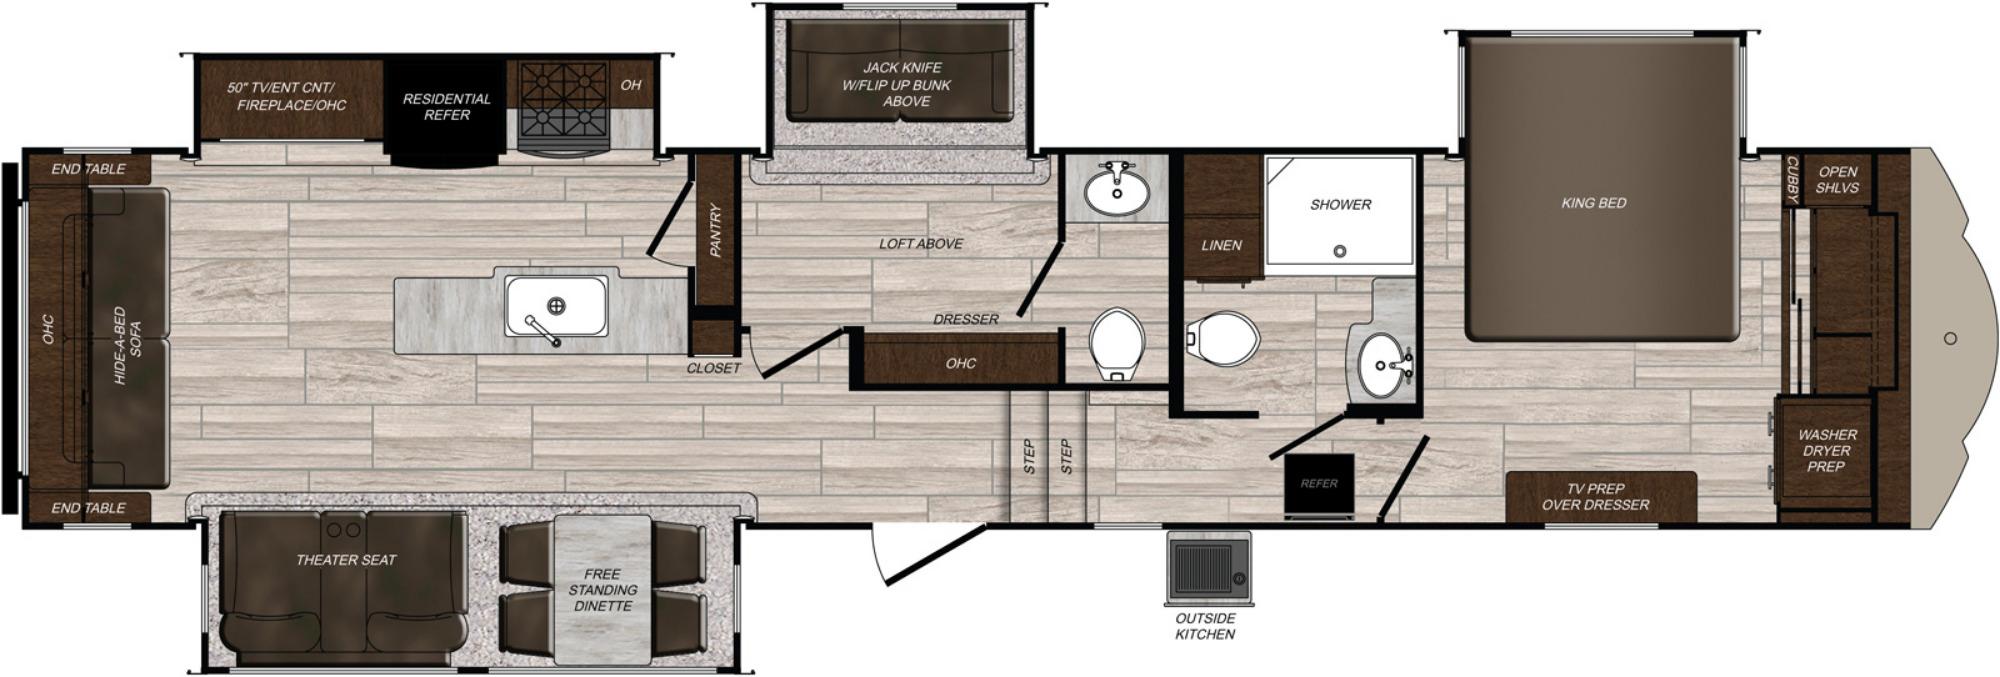 View Floor Plan for 2021 PRIME TIME SANIBEL 3902WB